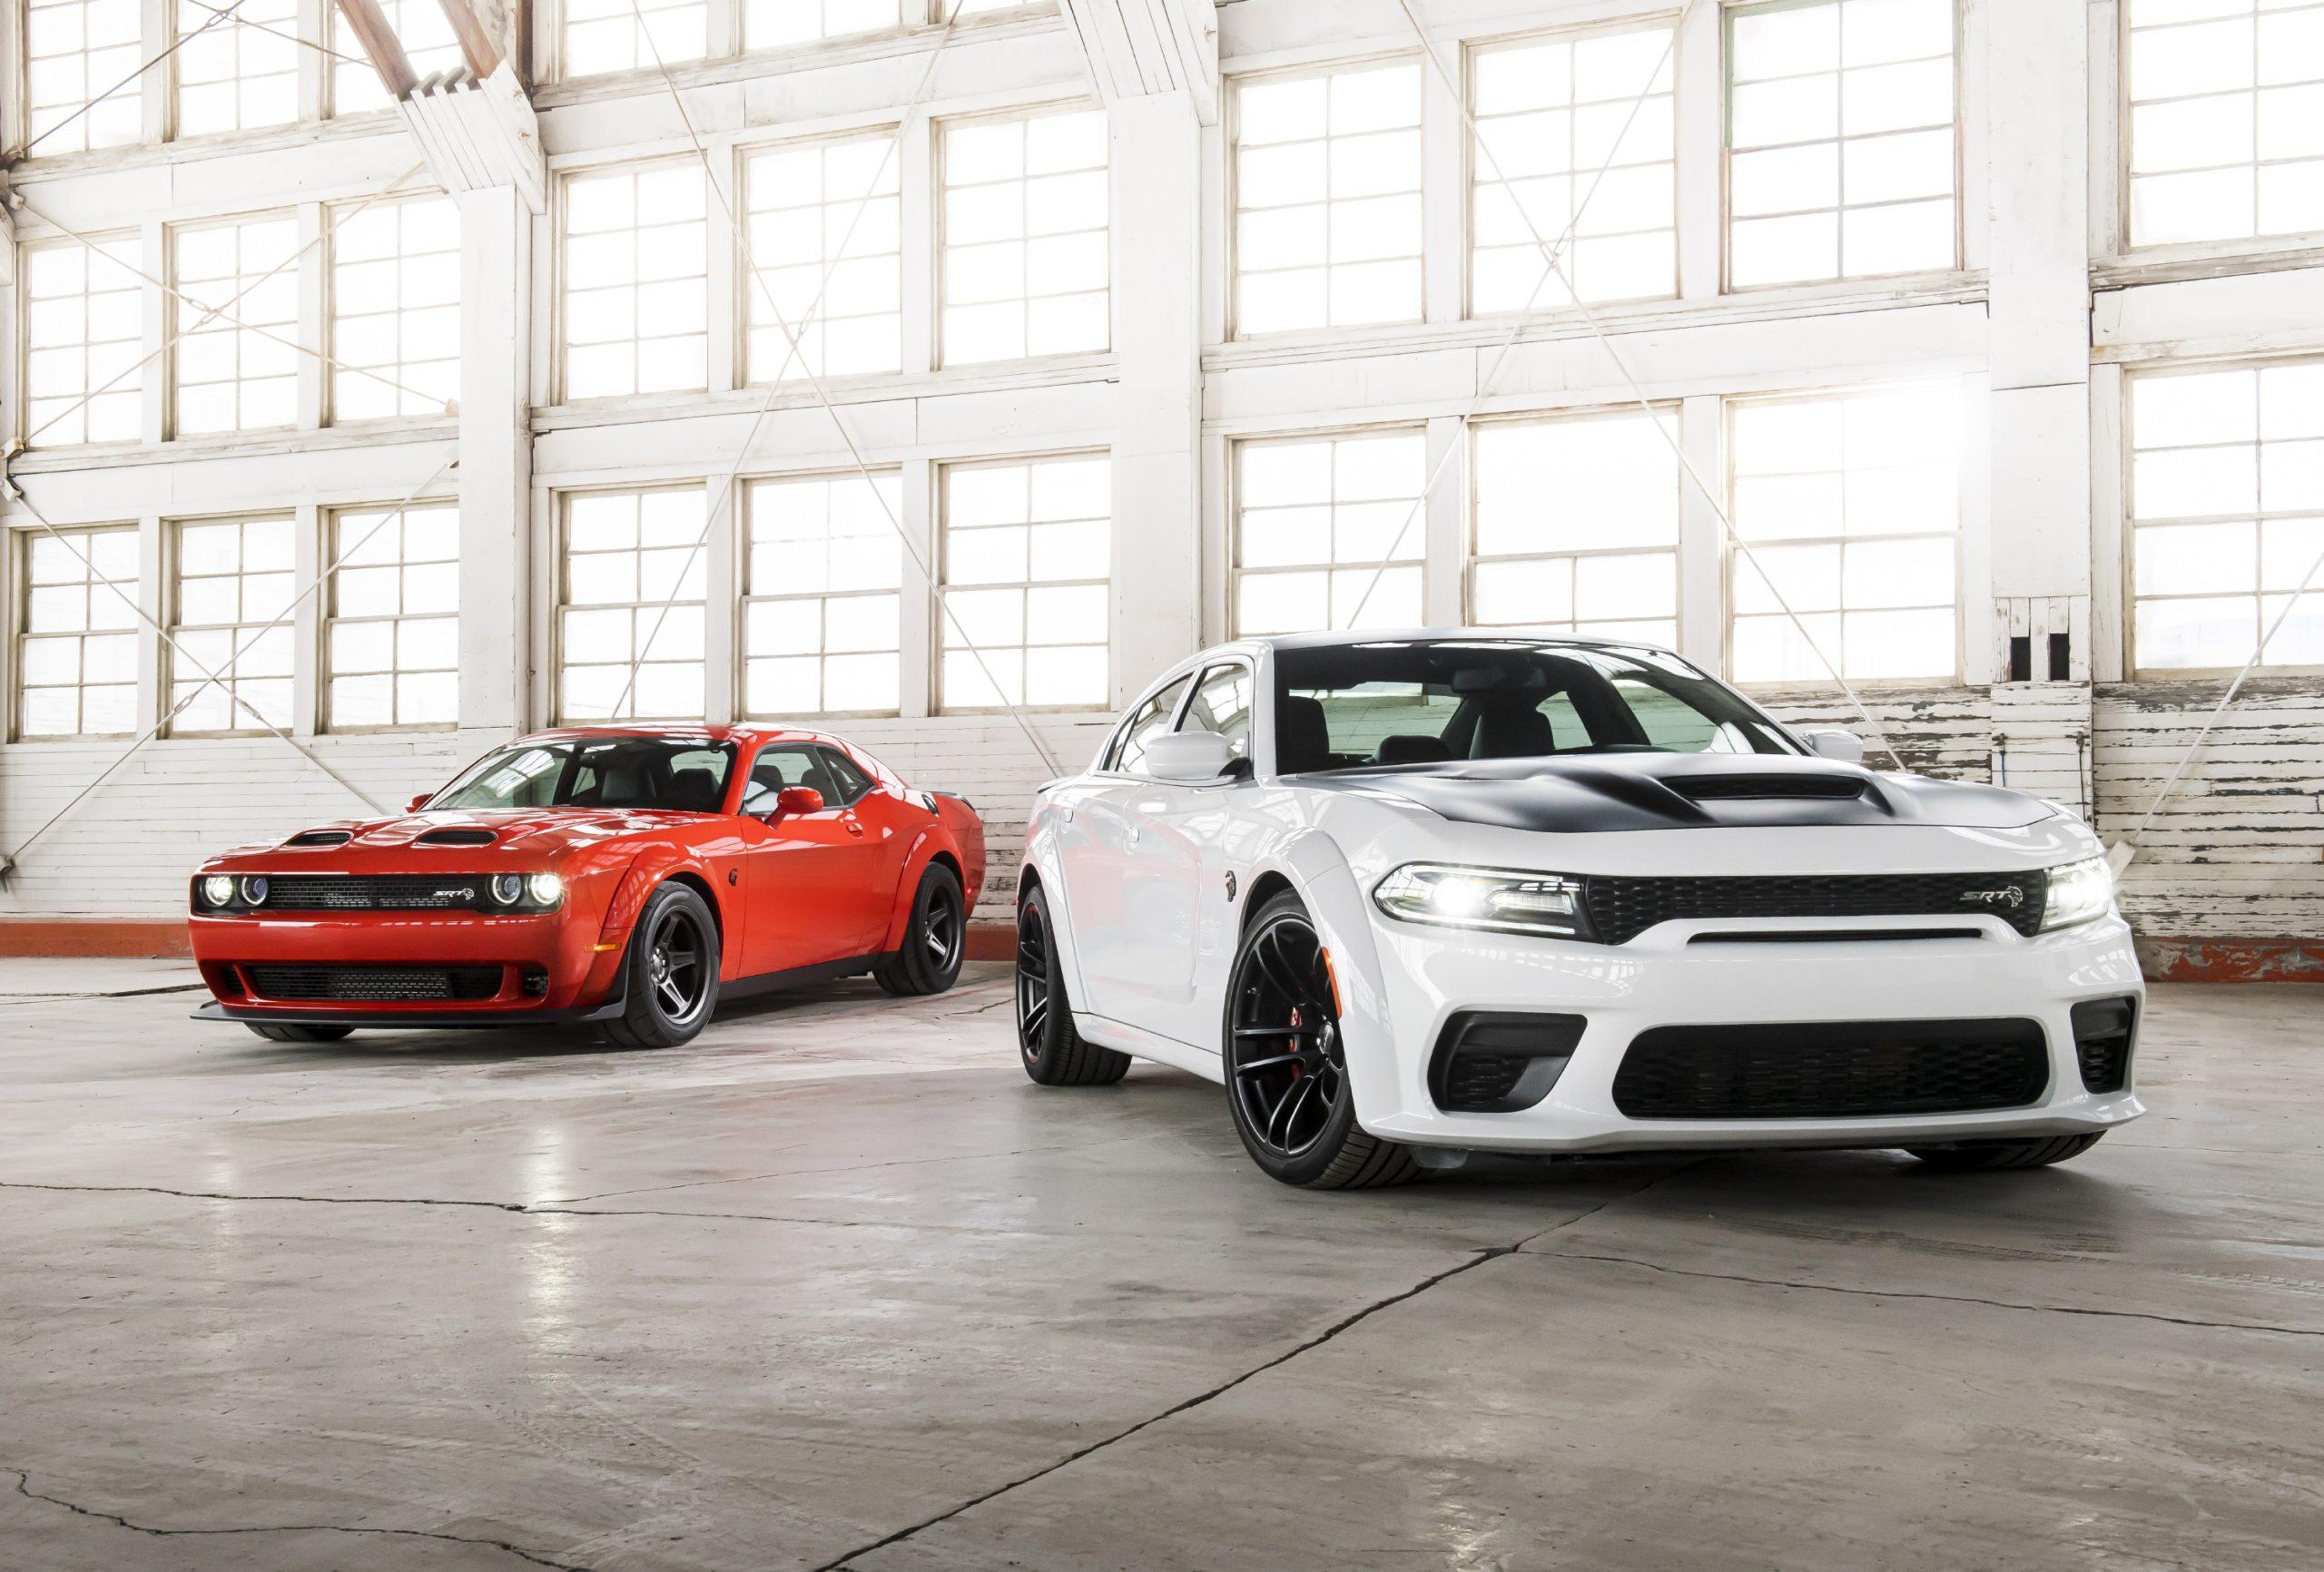 2021 Charger SRT Hellcat Redeye 2021 Durango SRT Hellcat 2020 Challenger SRT Super Stock